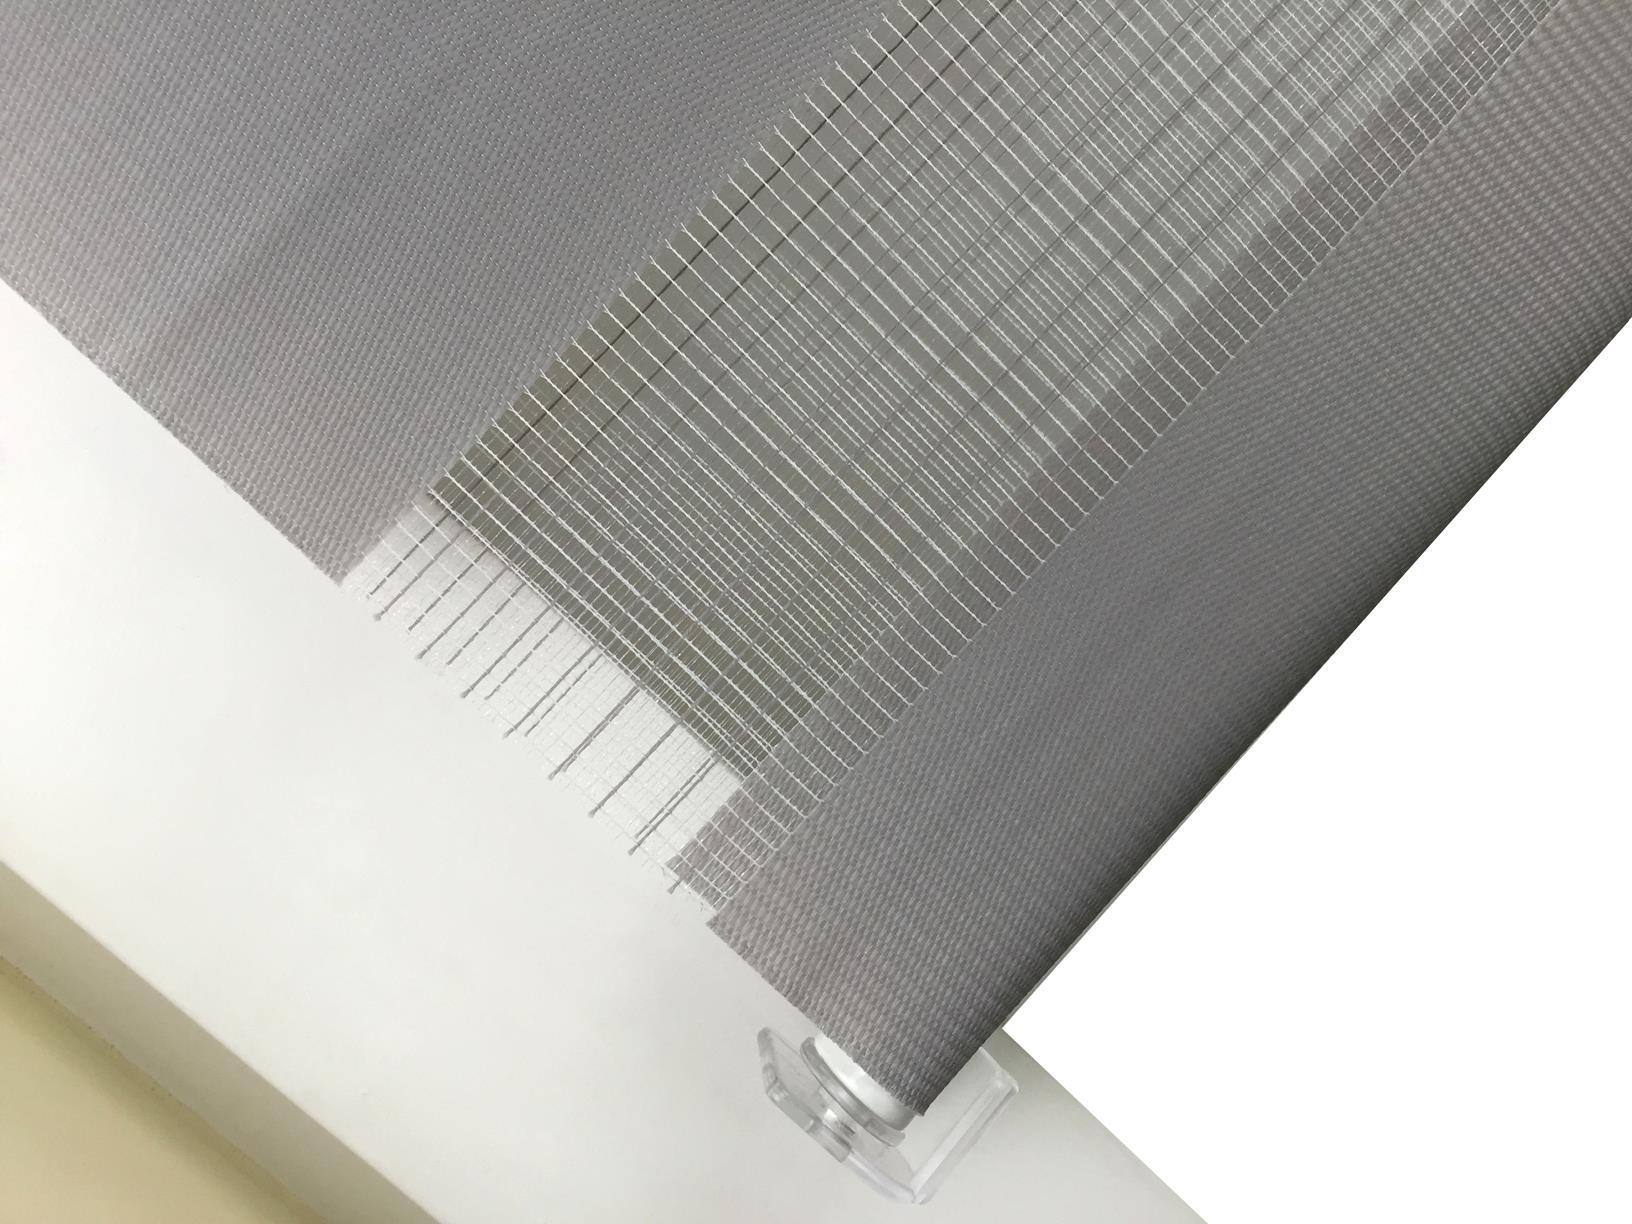 klemmfix duo rollo doppelrollo ohne bohren easyfix variorollo fenster klemmrollo ebay. Black Bedroom Furniture Sets. Home Design Ideas